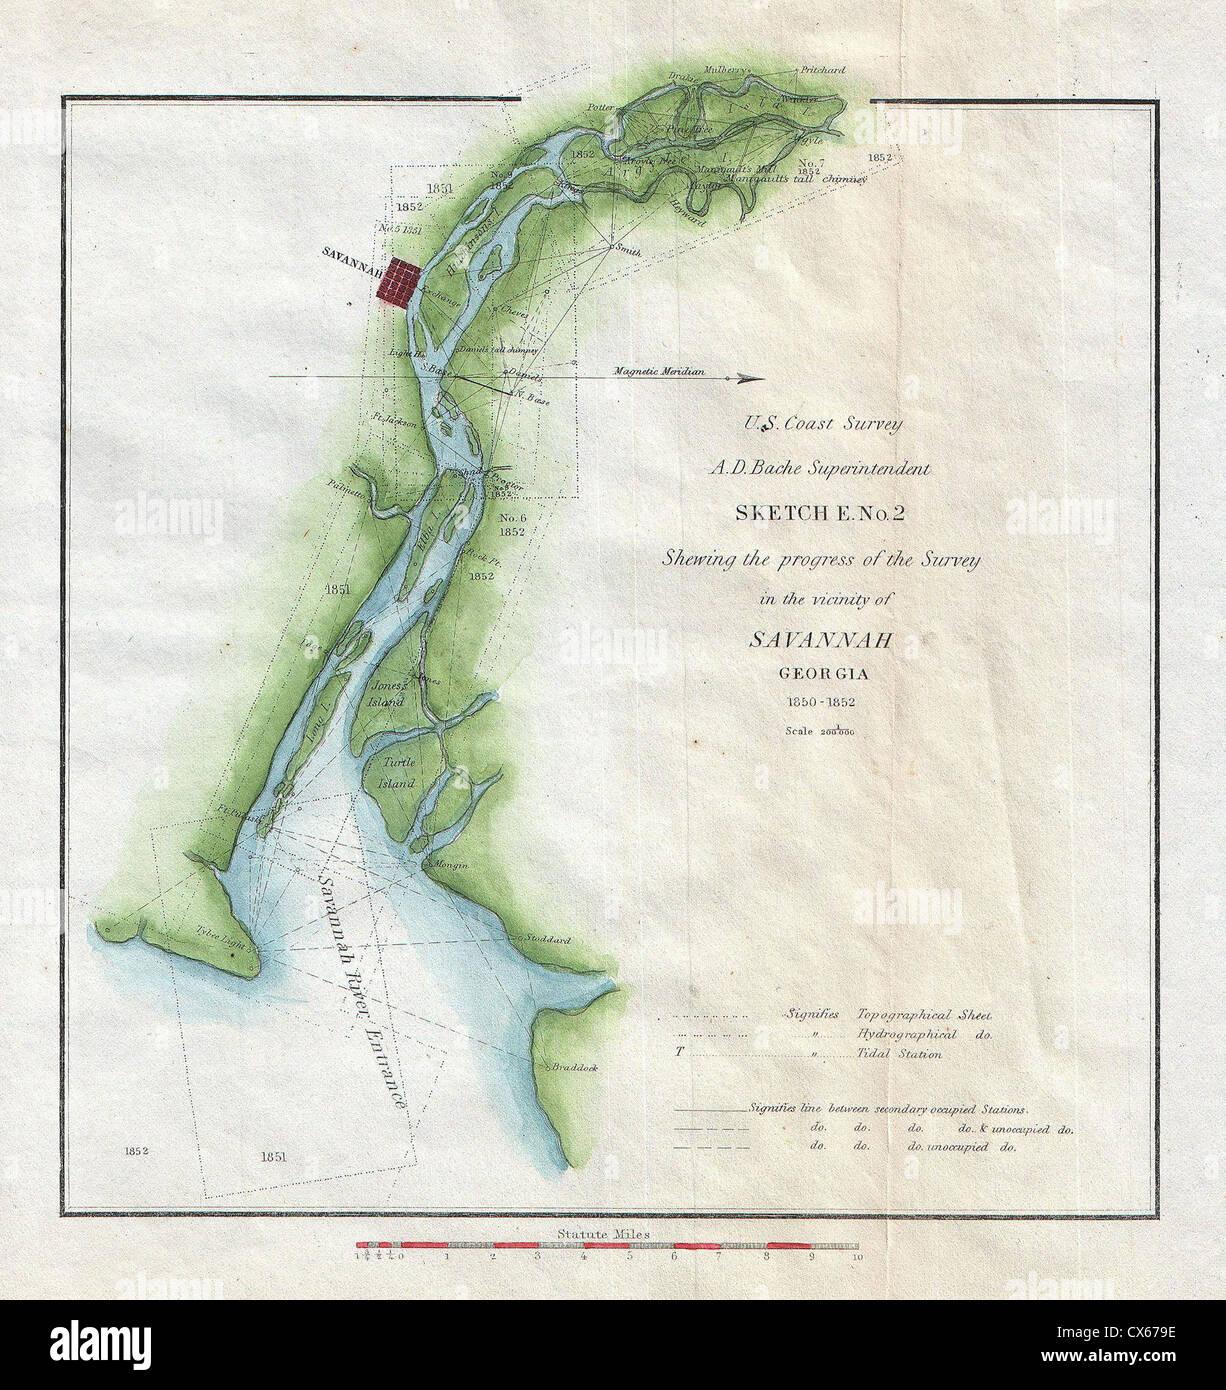 5 U.S. Coast Survey Map of Savannah Georgia and the Savannah